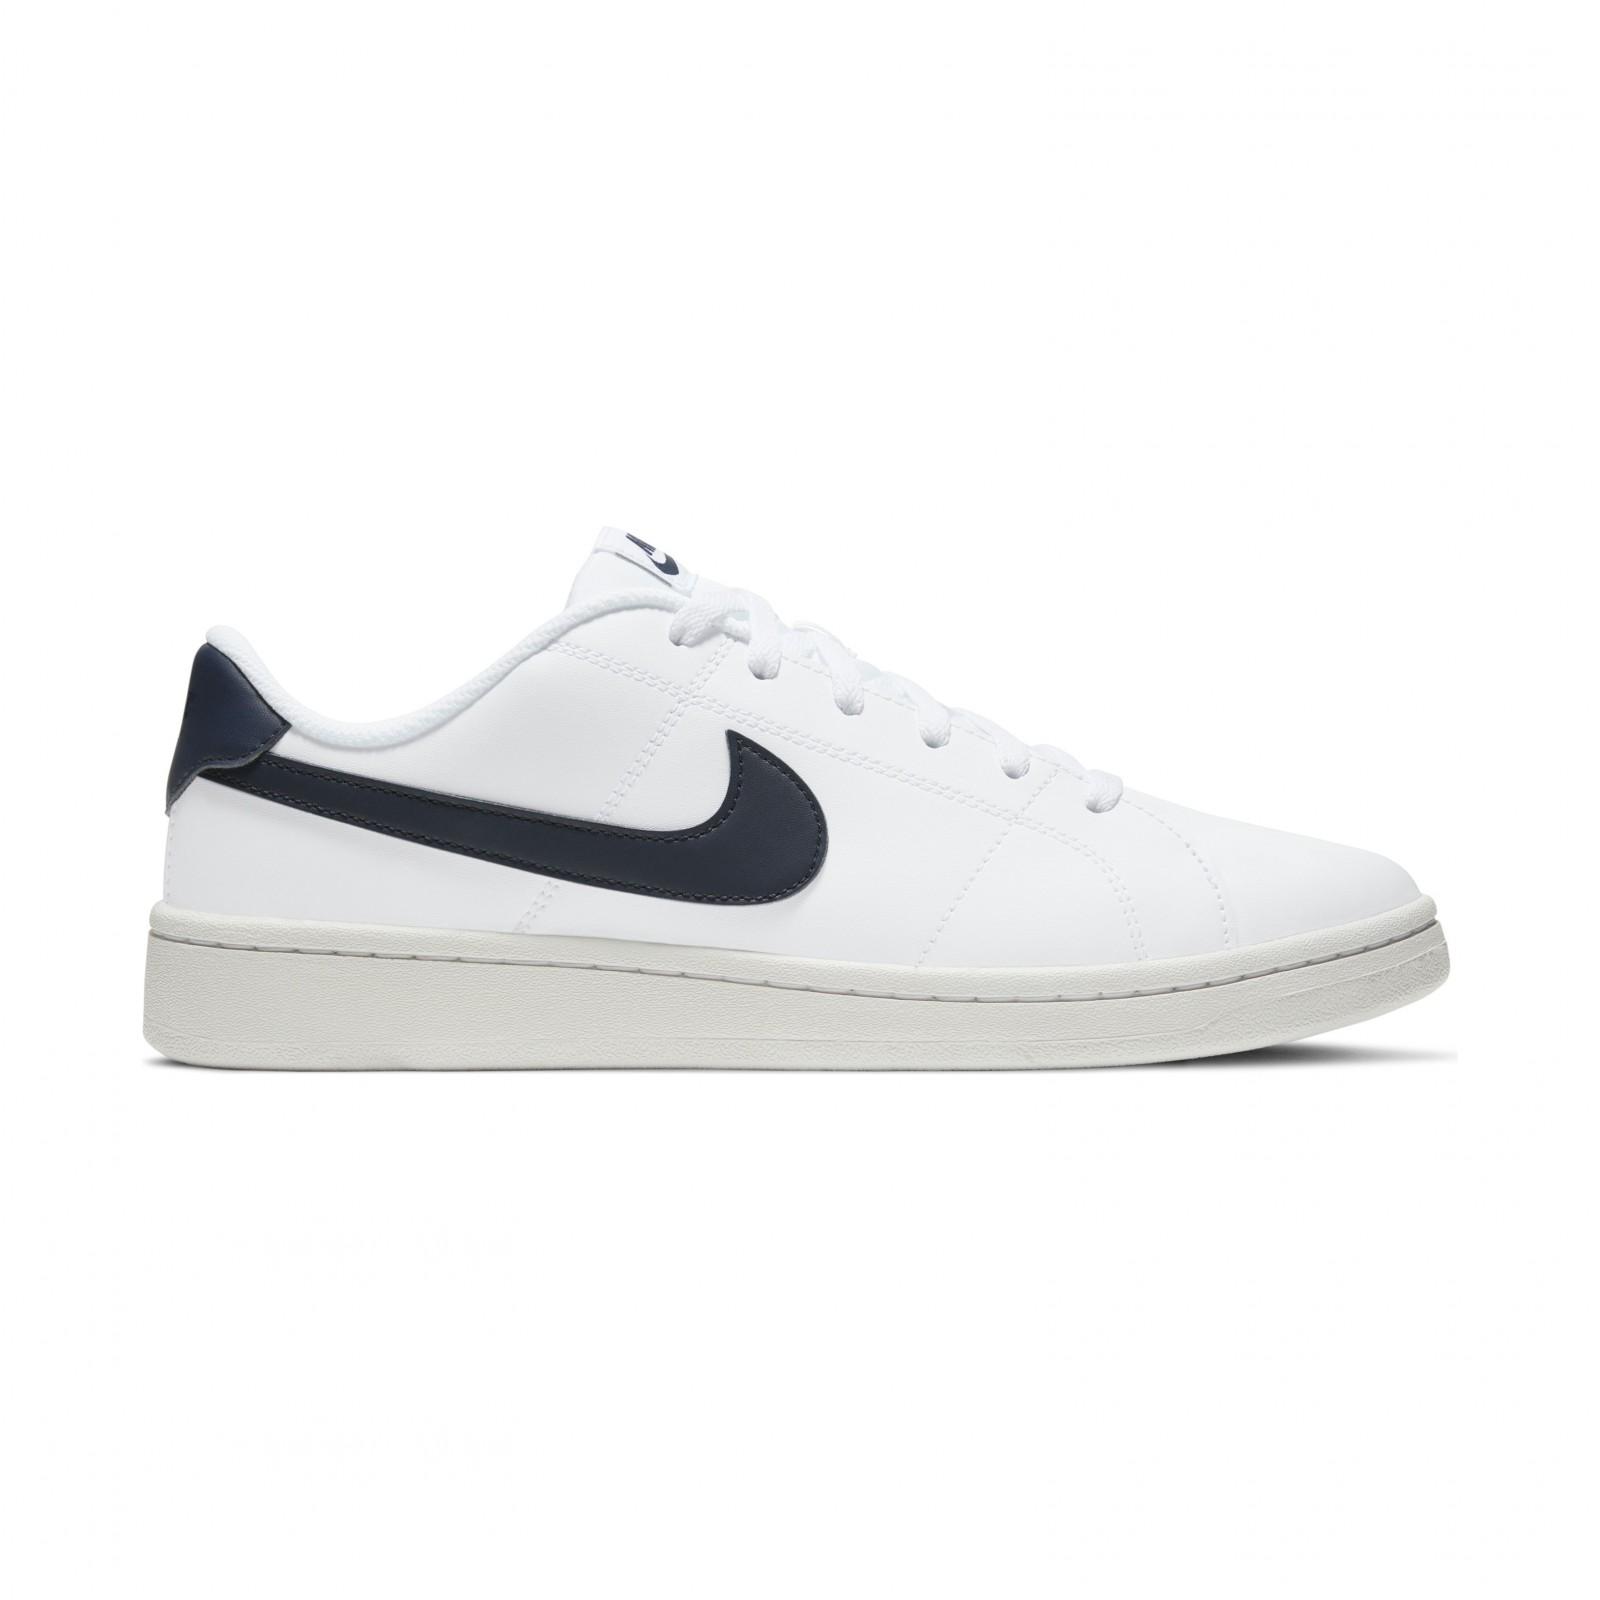 Nike Court Royale 2 Low WHITE/OBSIDIAN